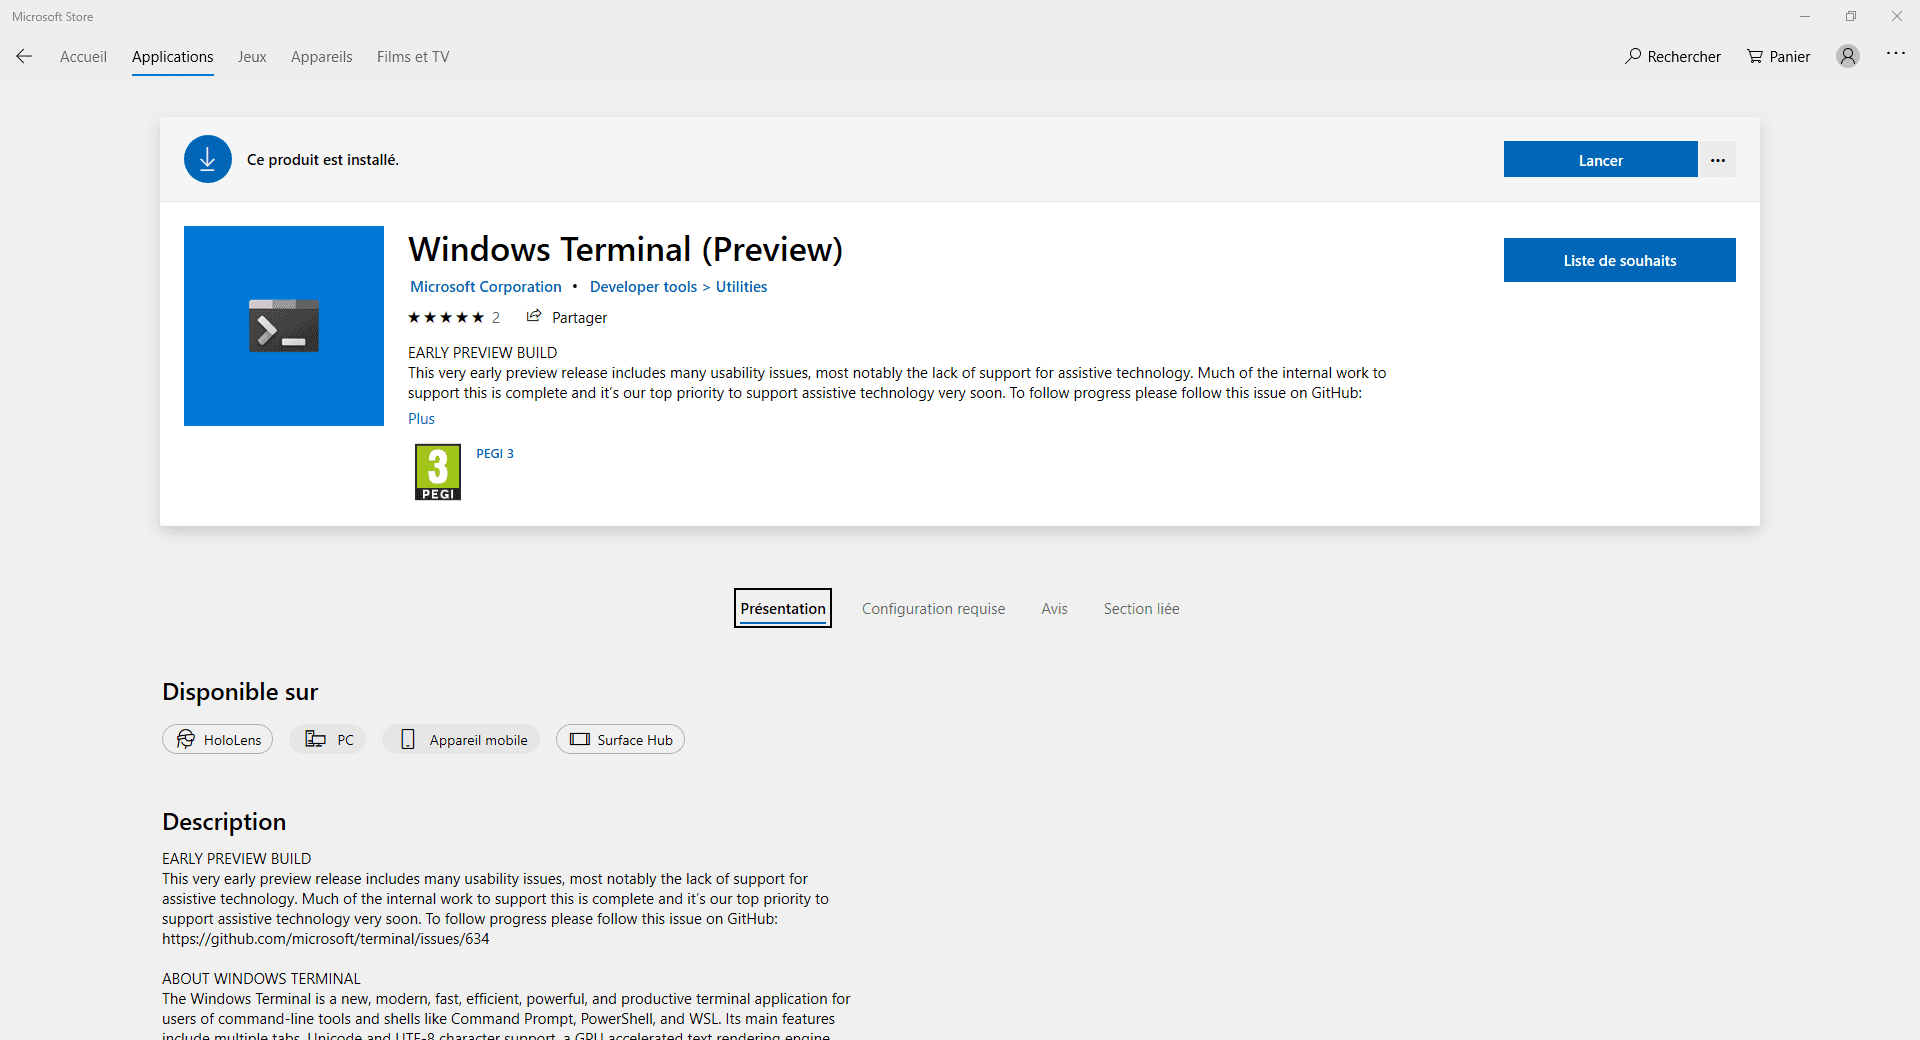 Windows Terminal disponible - RDR-IT